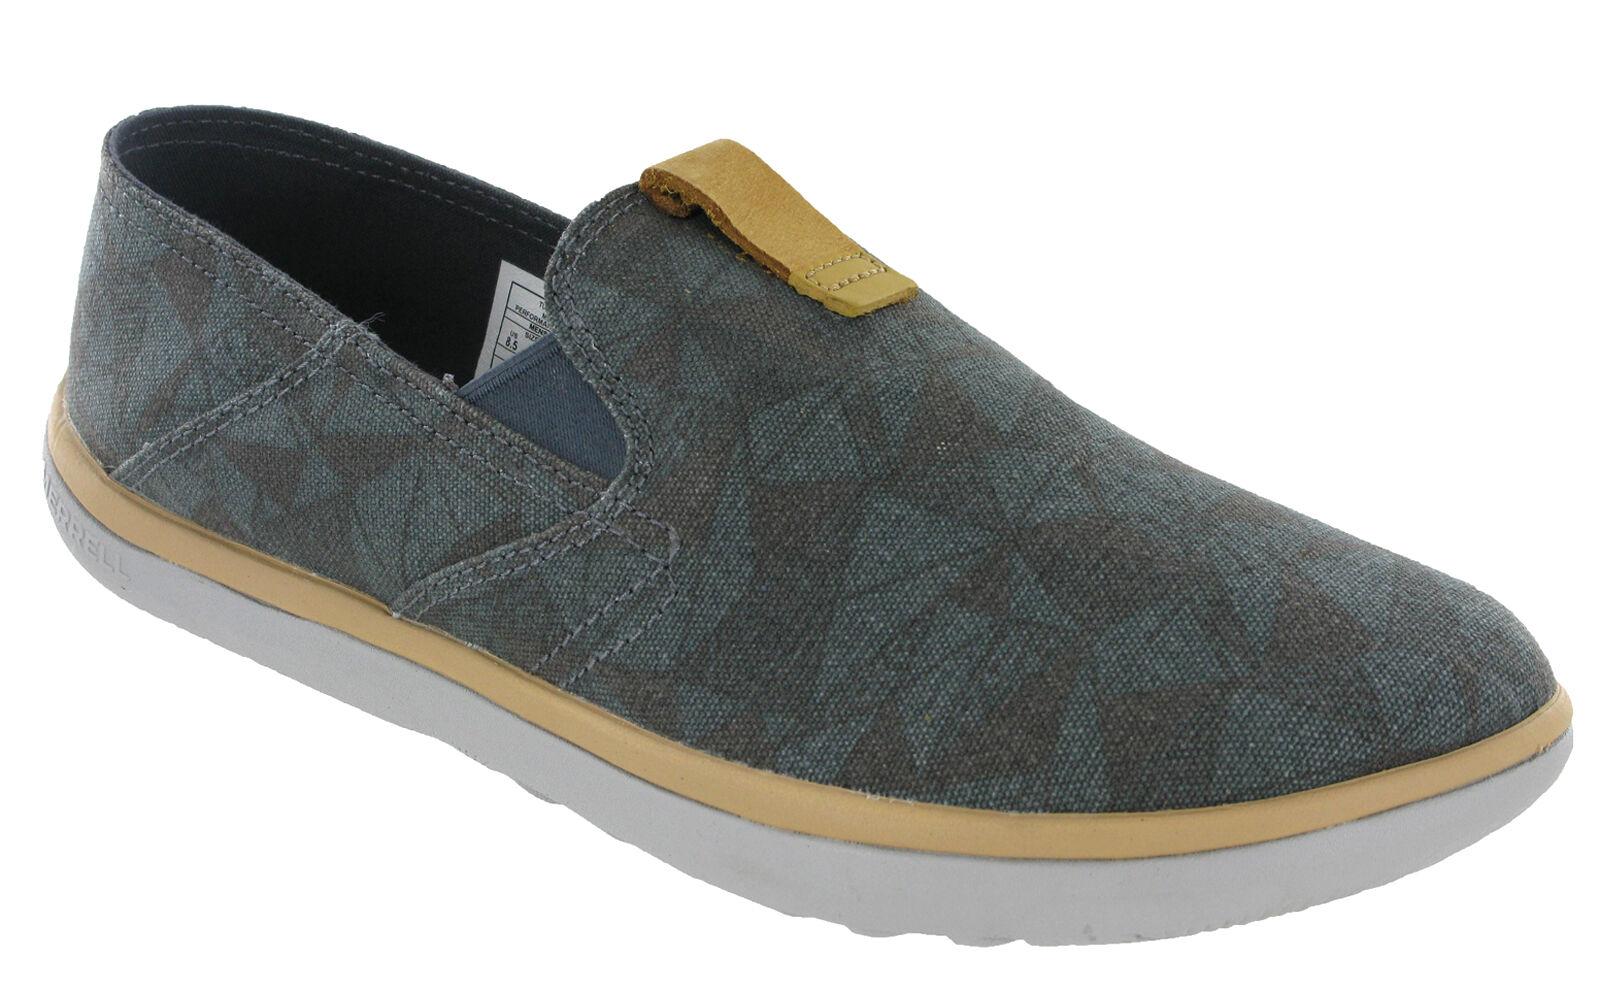 Merrell Duskair Moc Print Trainers Mens Canvas Lightweight Flat Pumps shoes